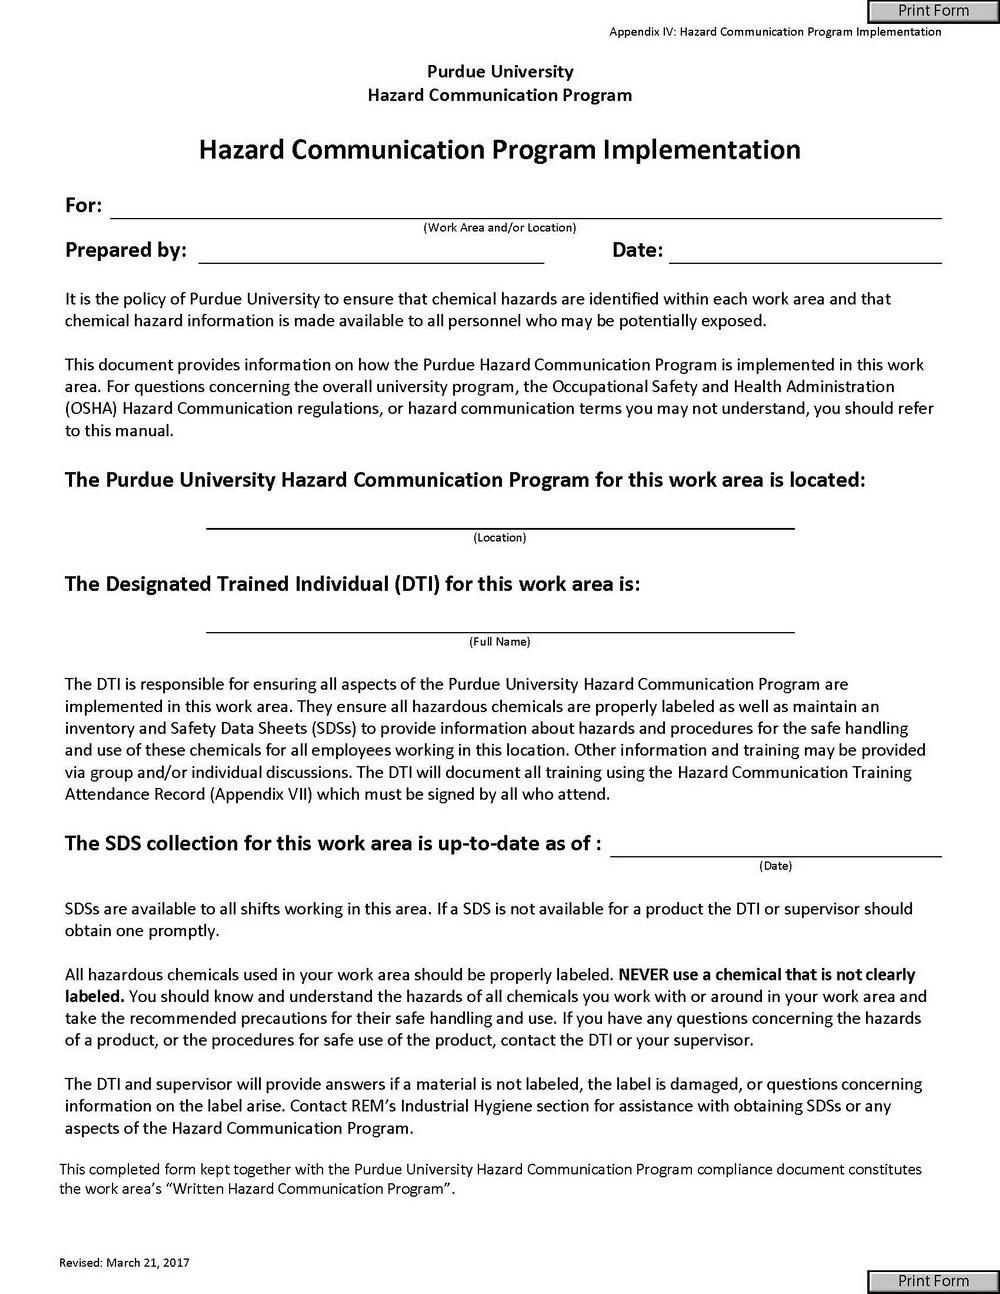 Hazard Communication Program Template